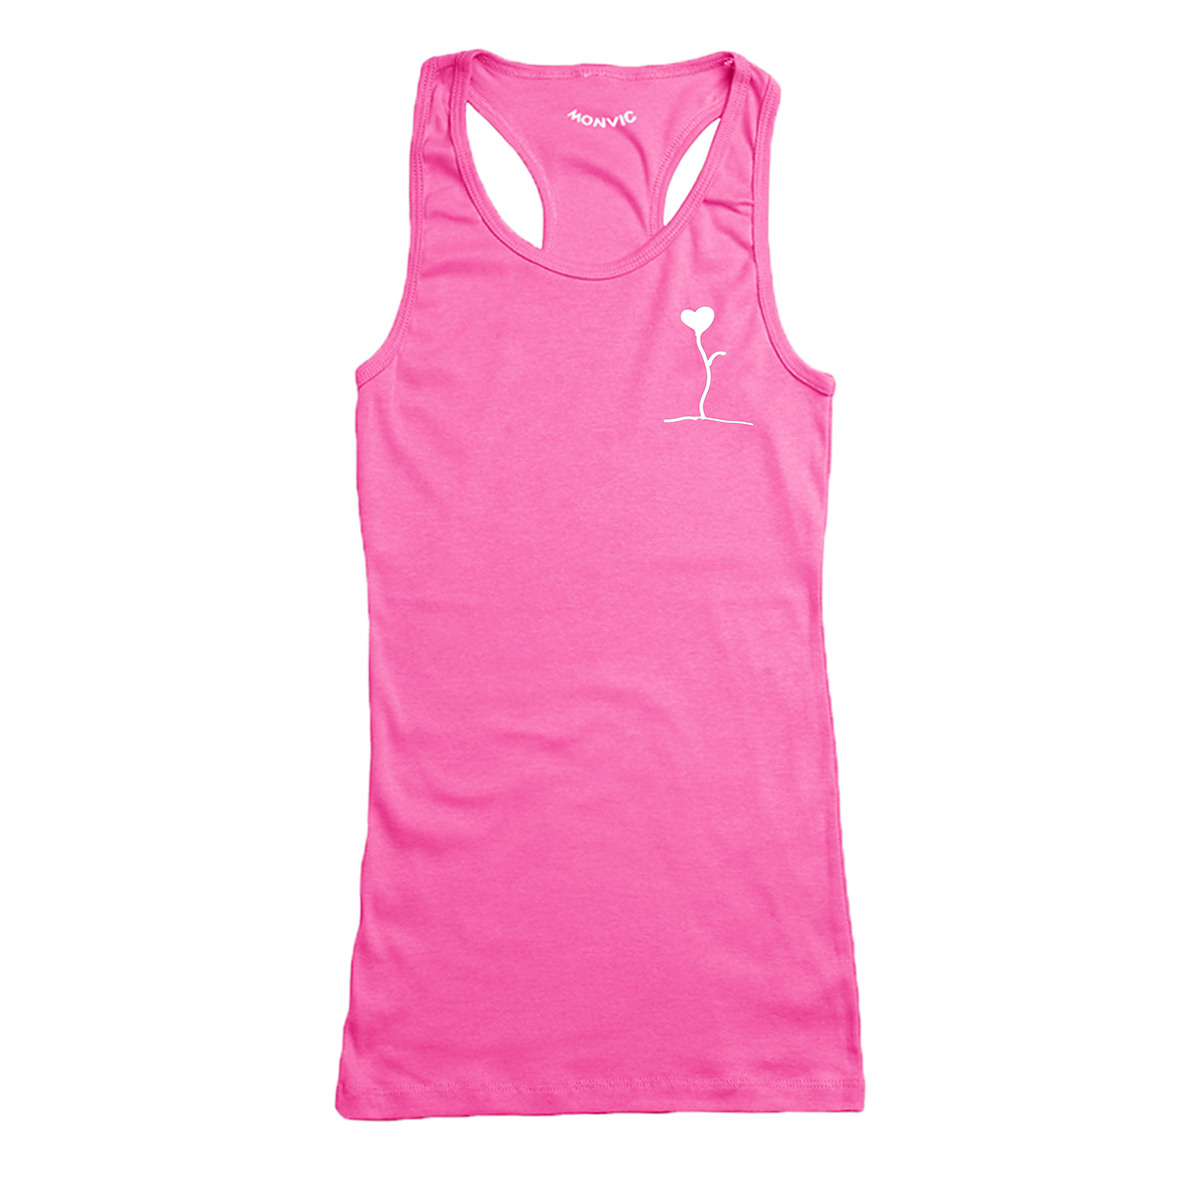 Monvic Koko X Tank Top Womens T Shirts Tops Epictv Shop Torch Tshirt Women Pink Fuchsia L Climbing